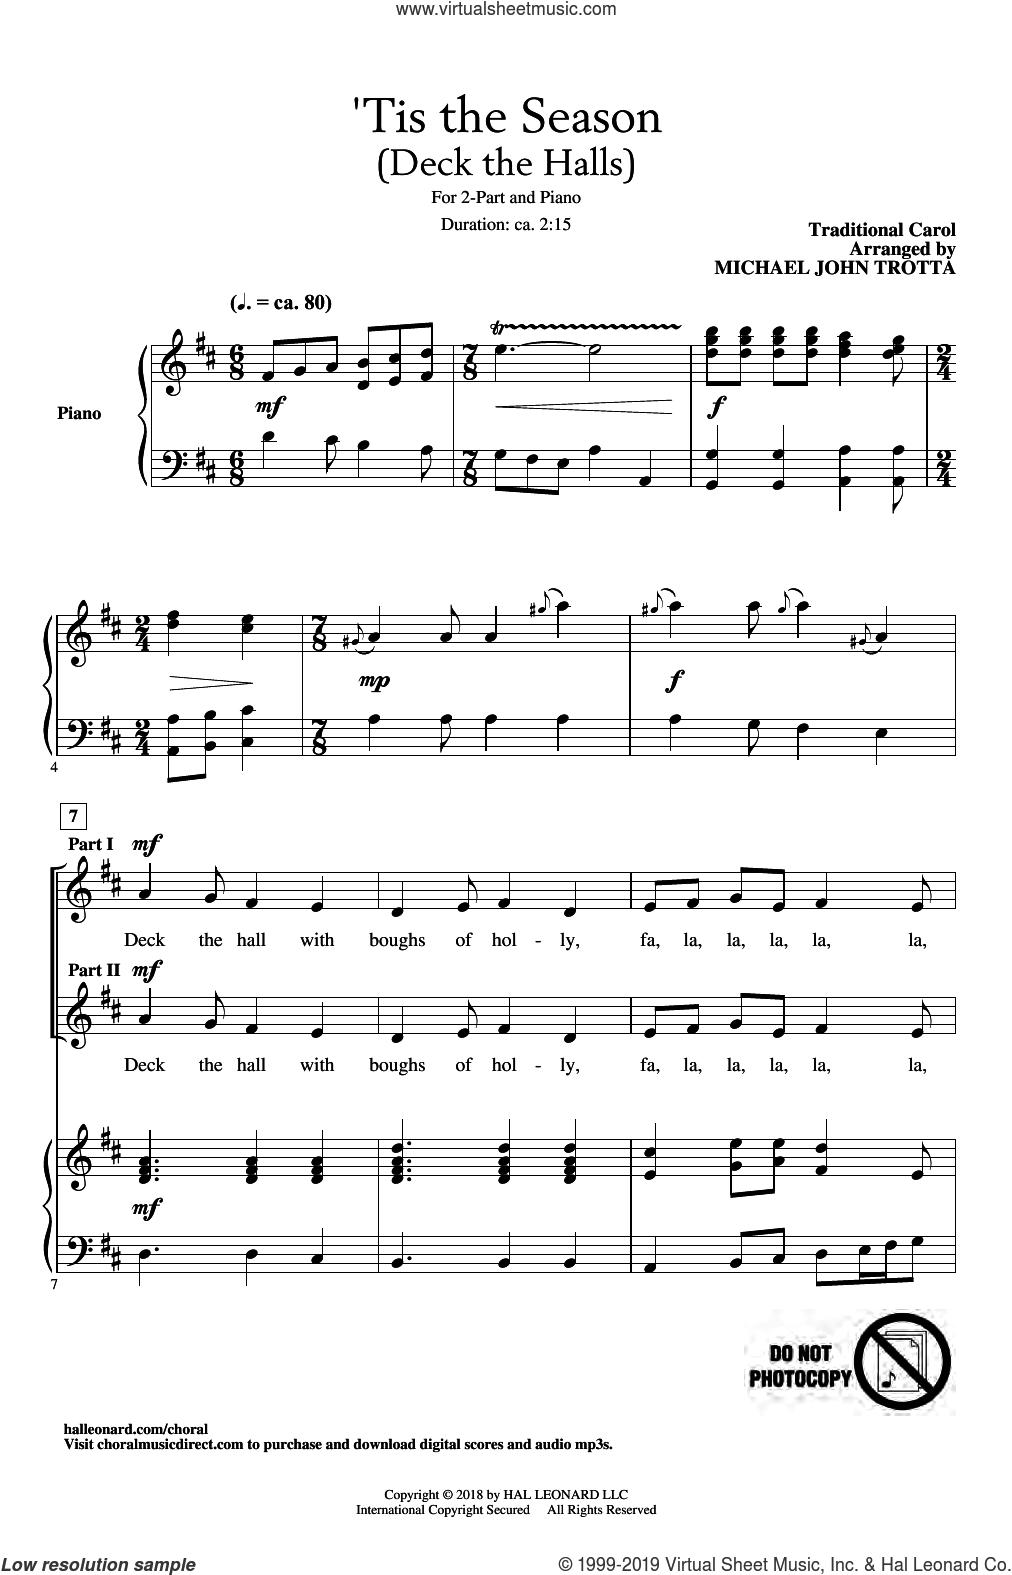 'Tis The Season (Deck The Halls) (arr. Michael John Trotta) sheet music for choir (2-Part)  and Michael John Trotta, intermediate duet